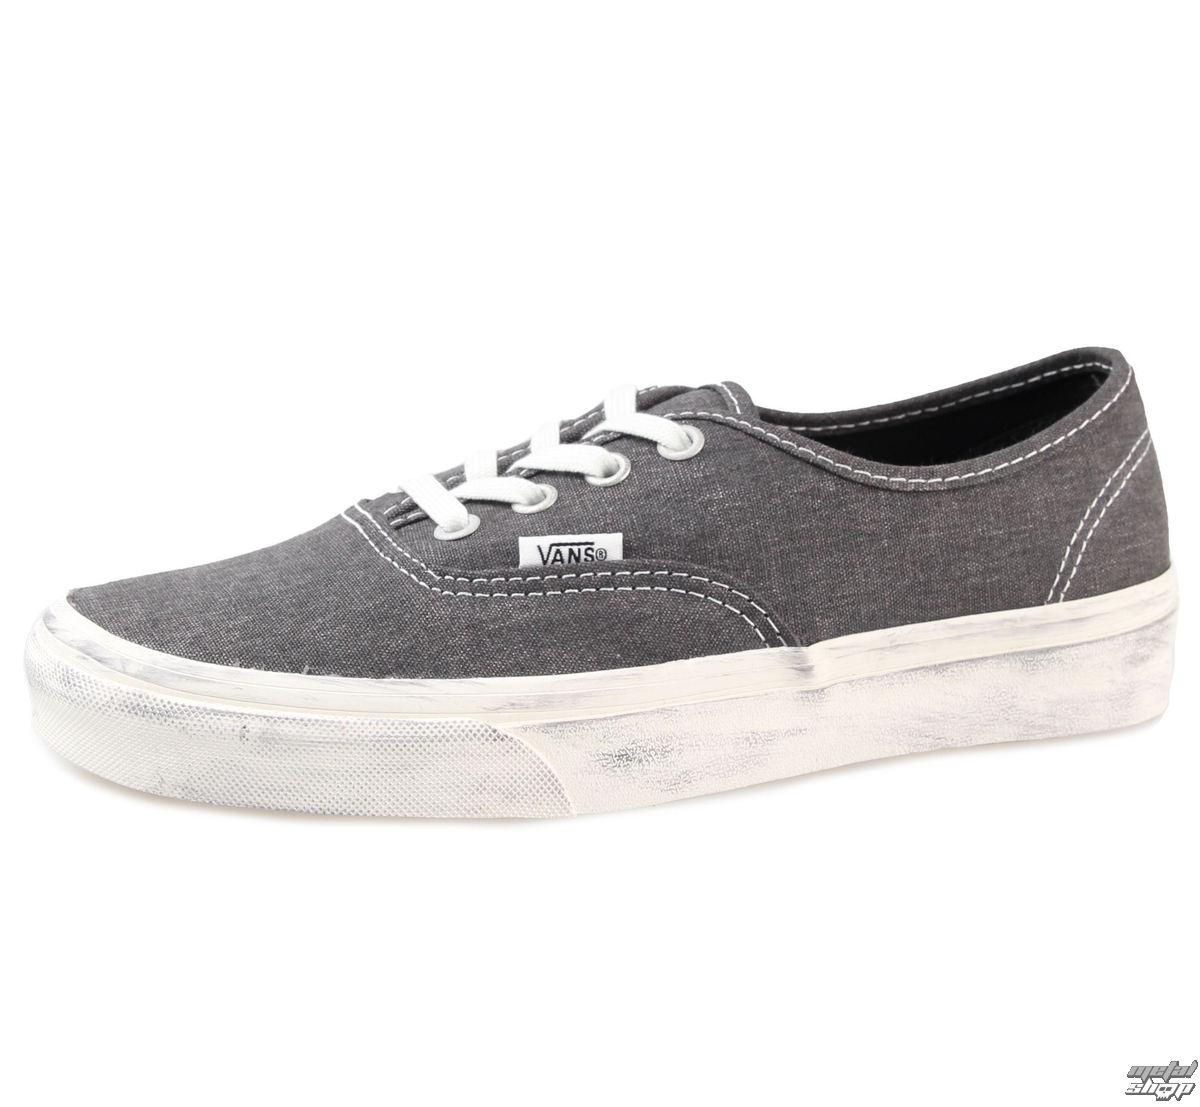 9e526c81efb chaussures de tennis basses pour femmes - VANS - V18BH1V - metalmonde.fr